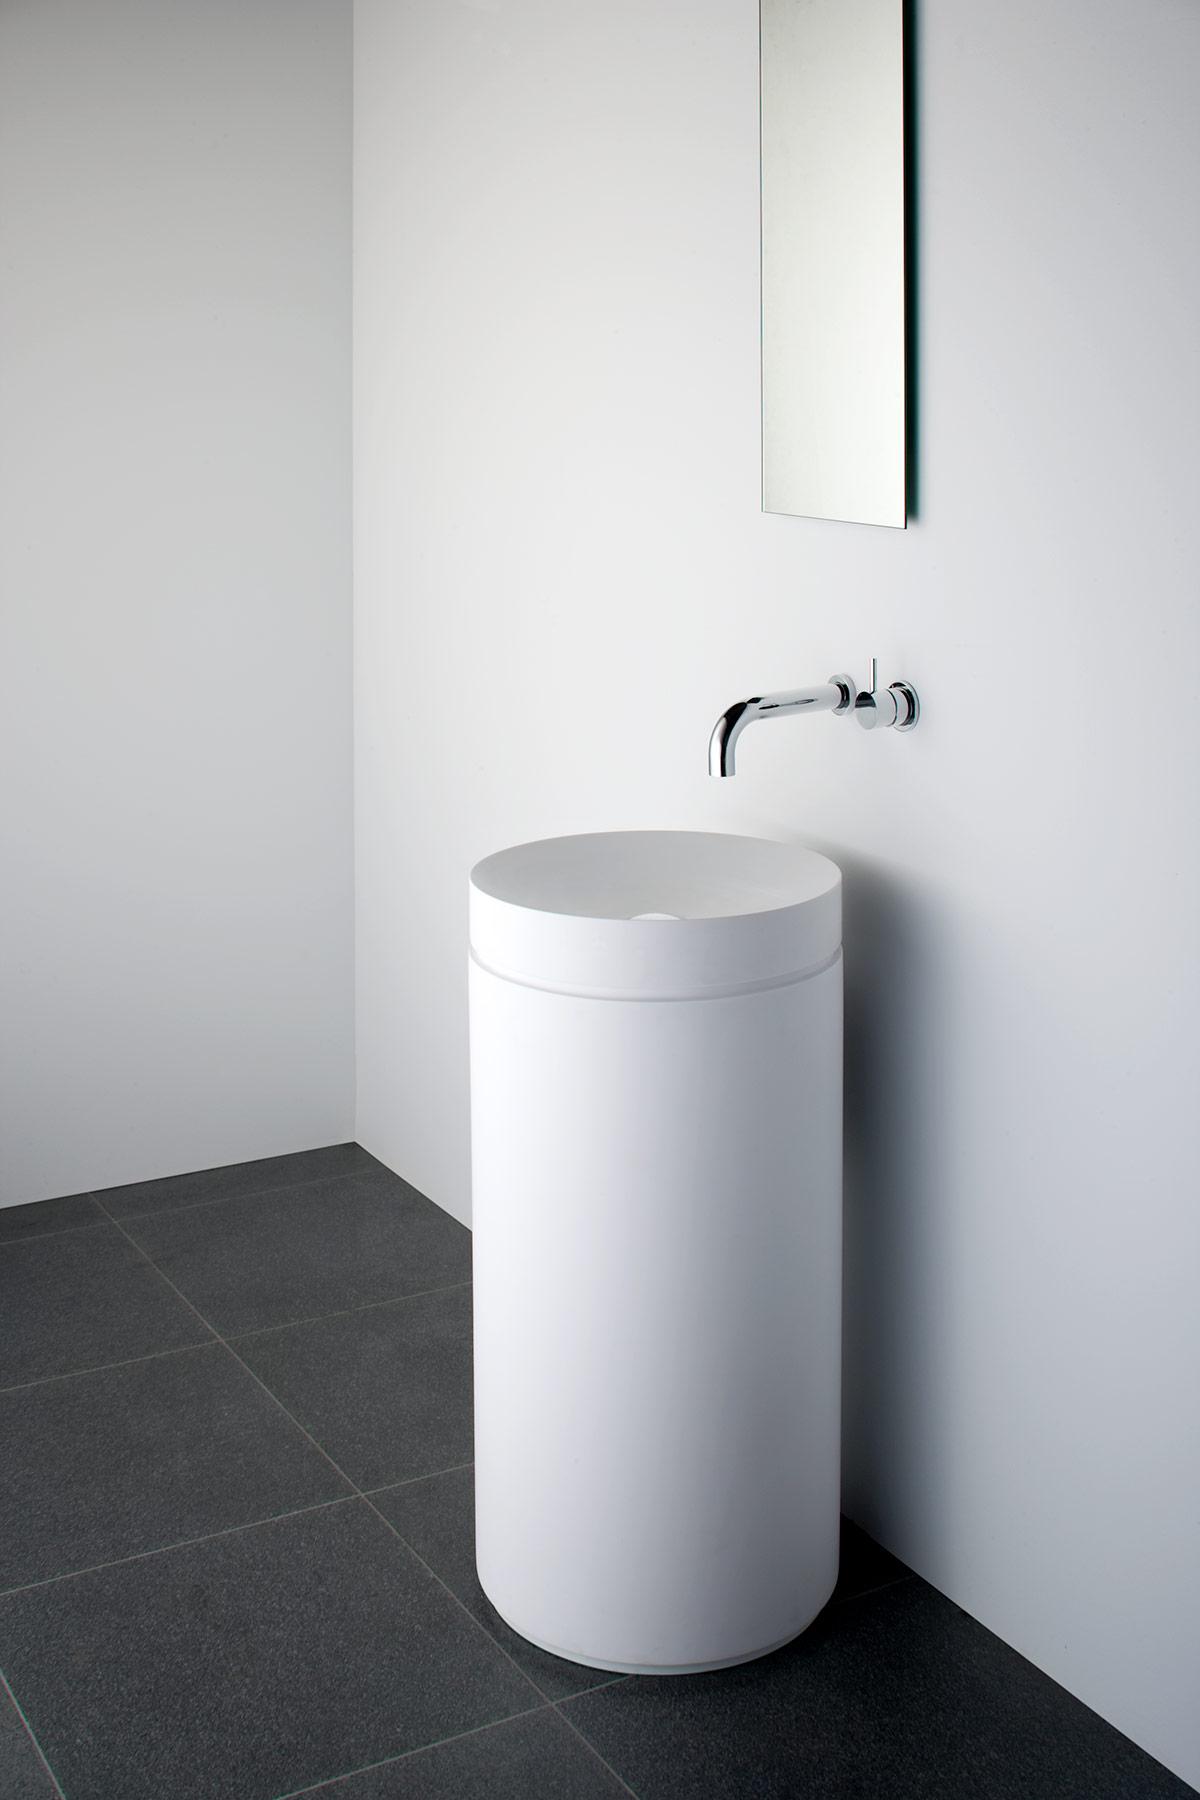 Transitional Mono Freestanding Pedestal Basin